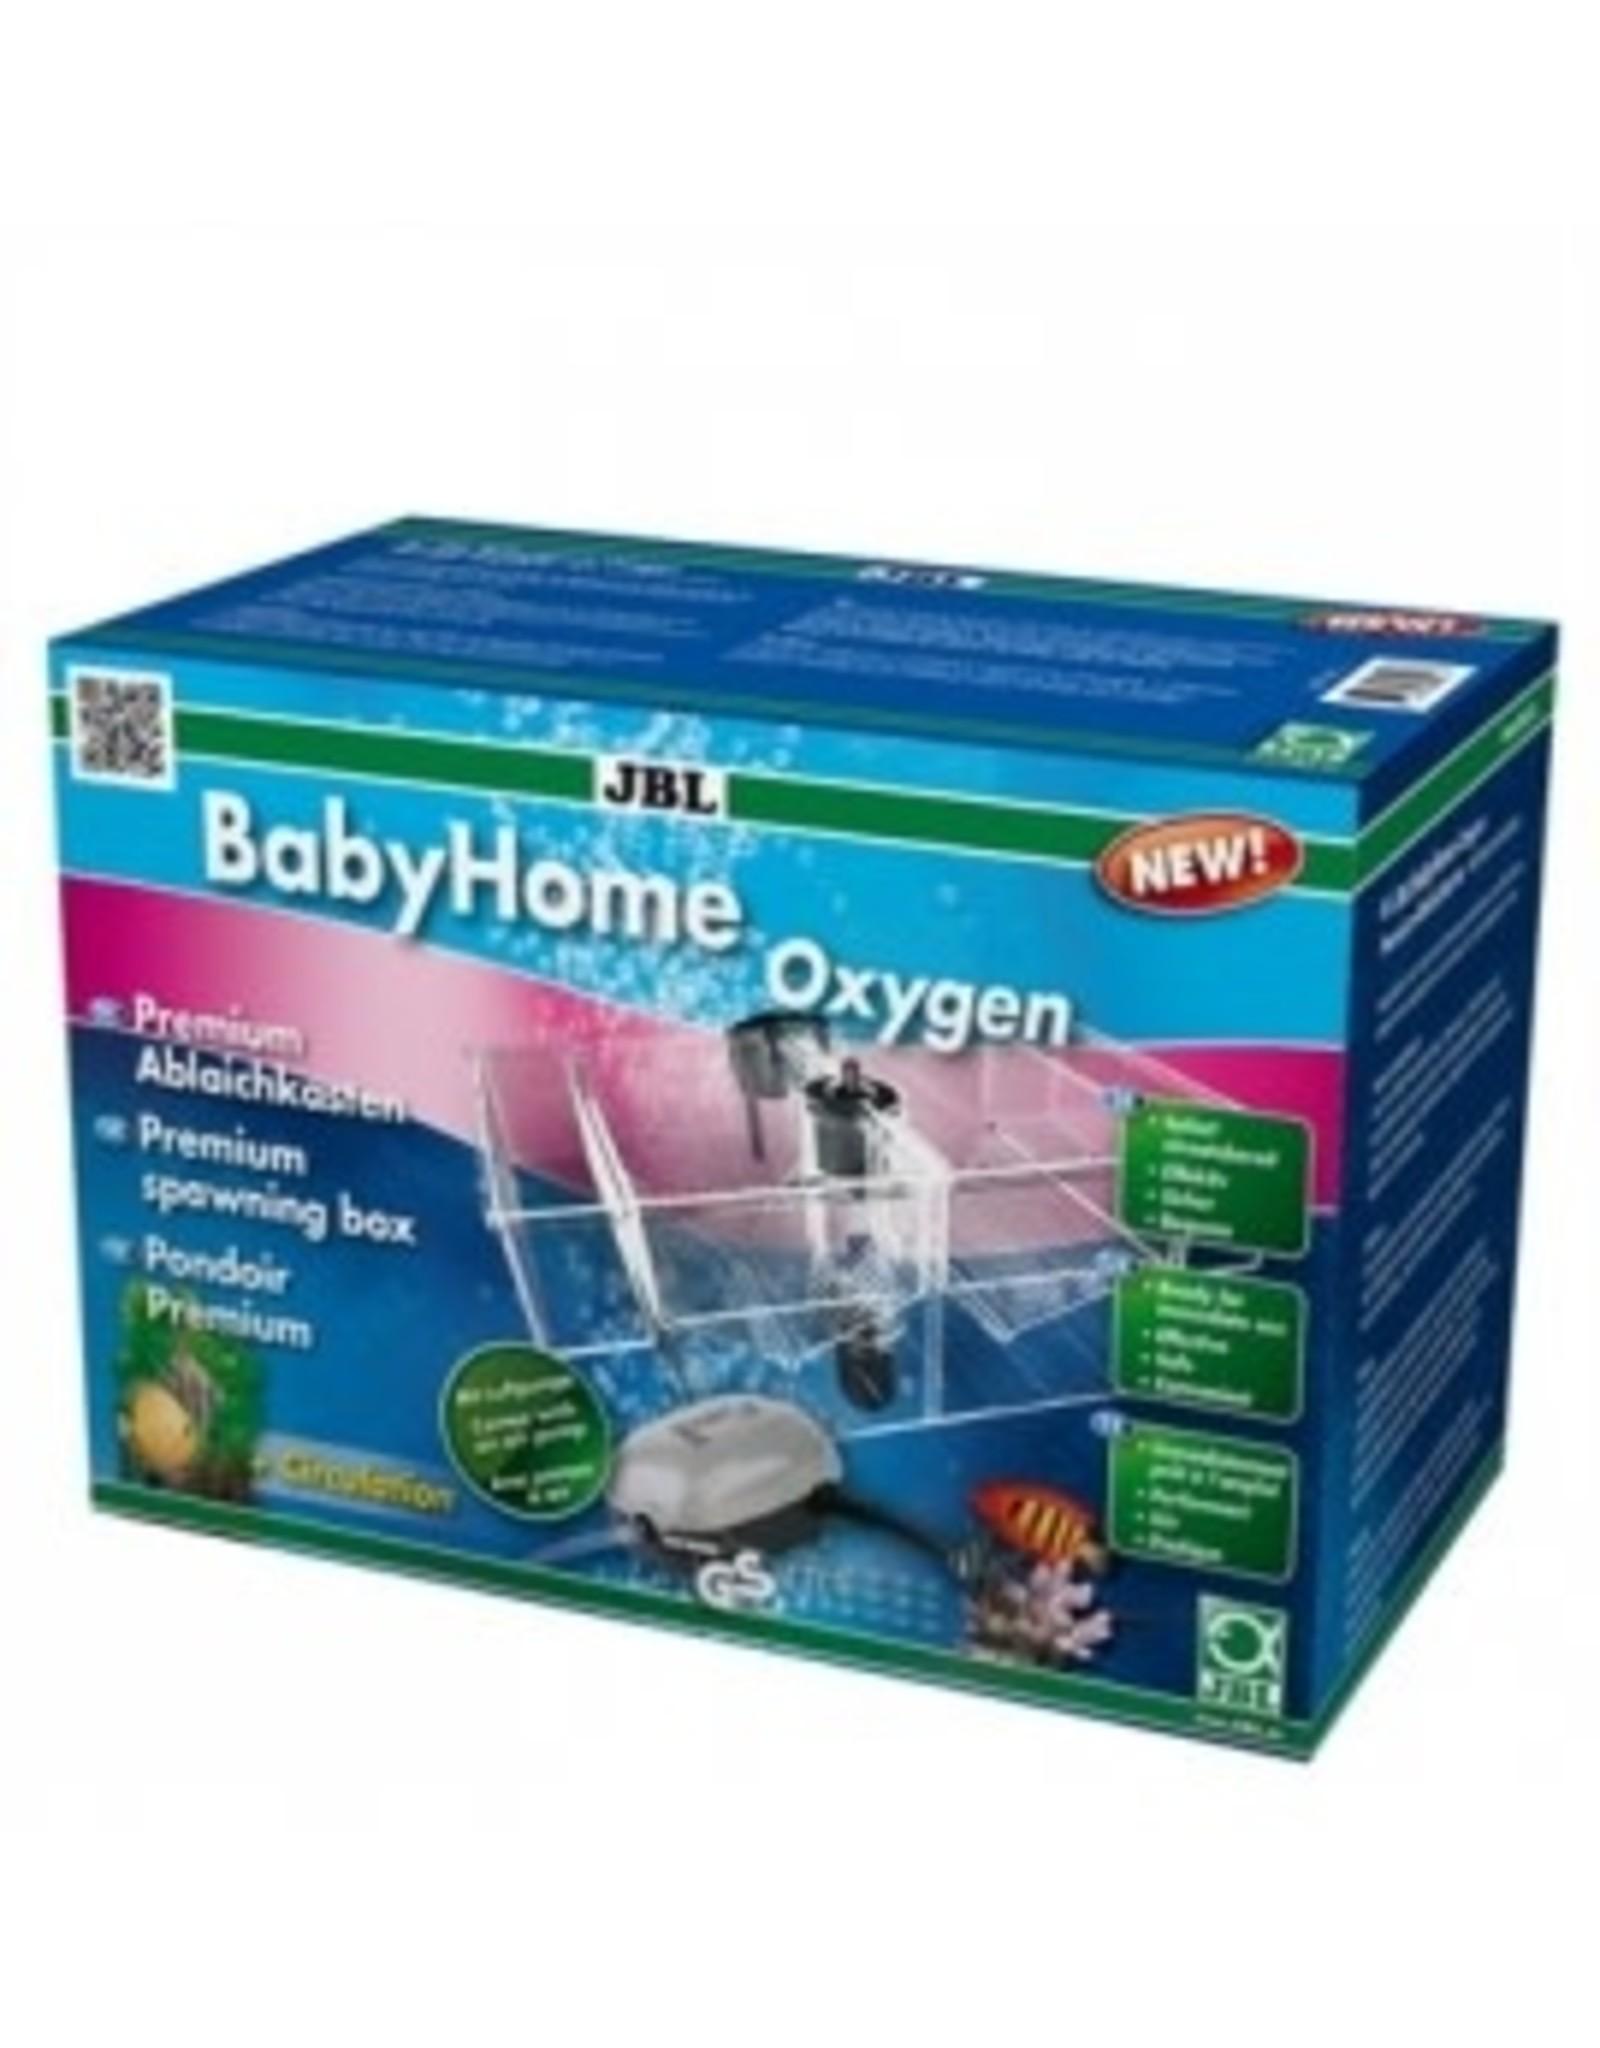 JBL BABY HOME Oxygen JBL